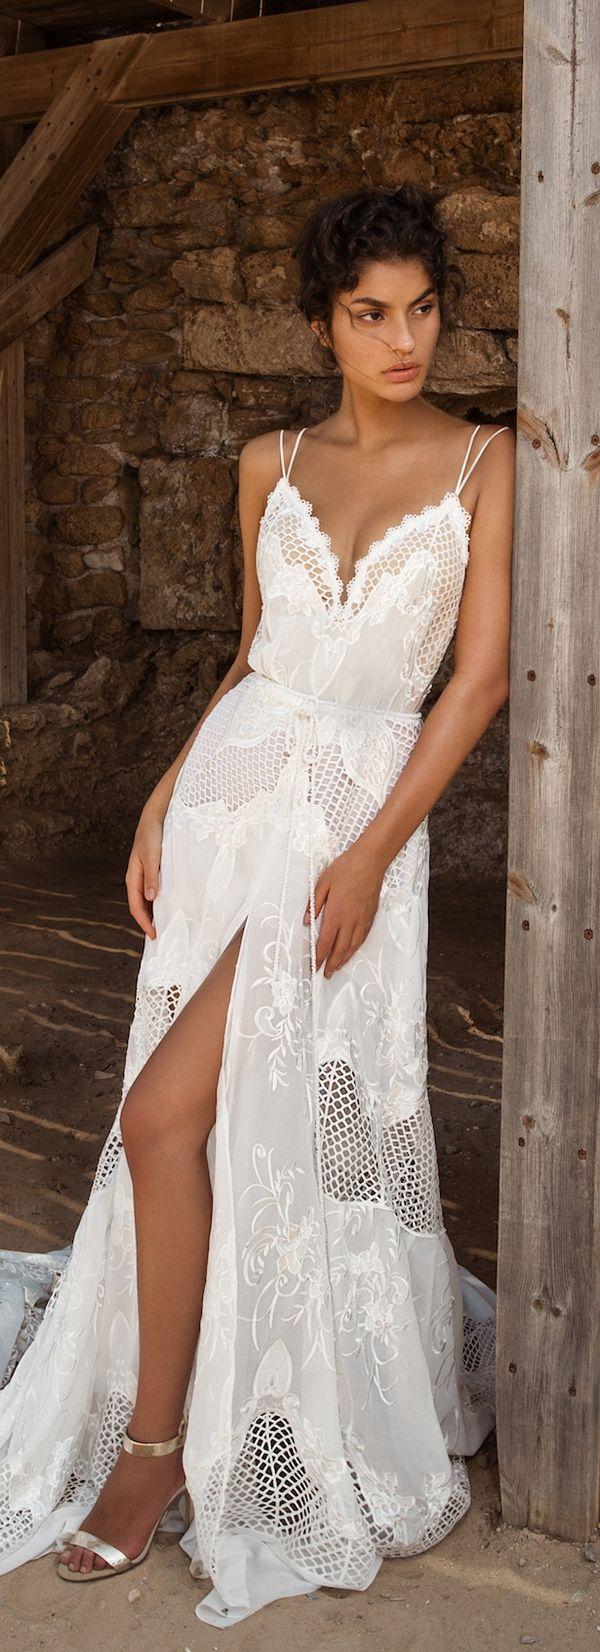 best t h e dress images on pinterest wedding frocks bridal